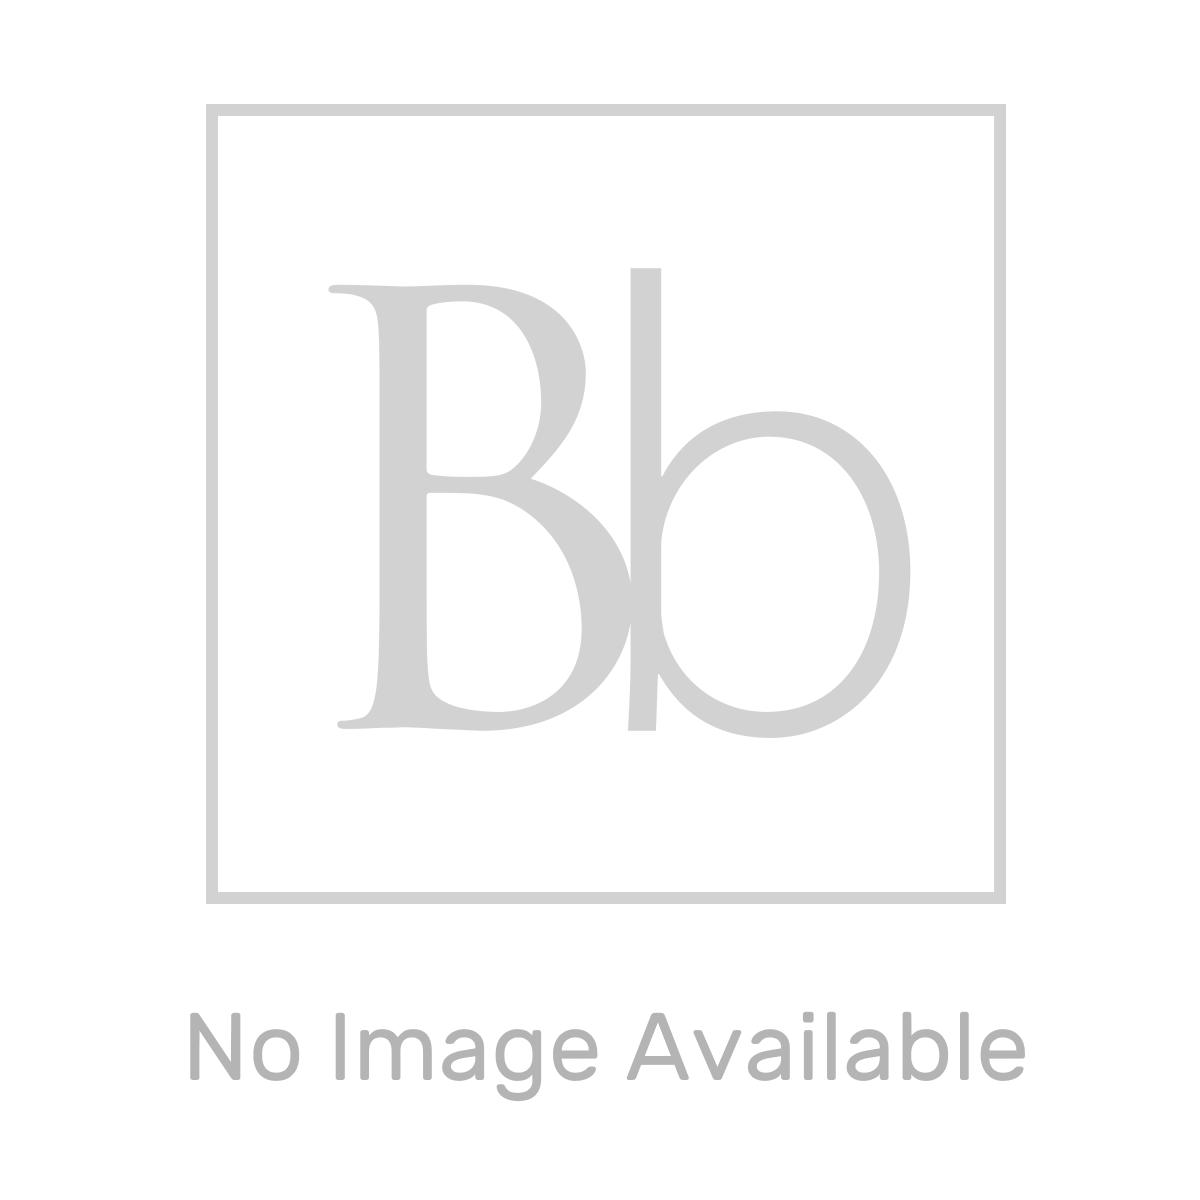 Bali White Ash Wall Mounted Vanity Unit 600mm Lifestyle